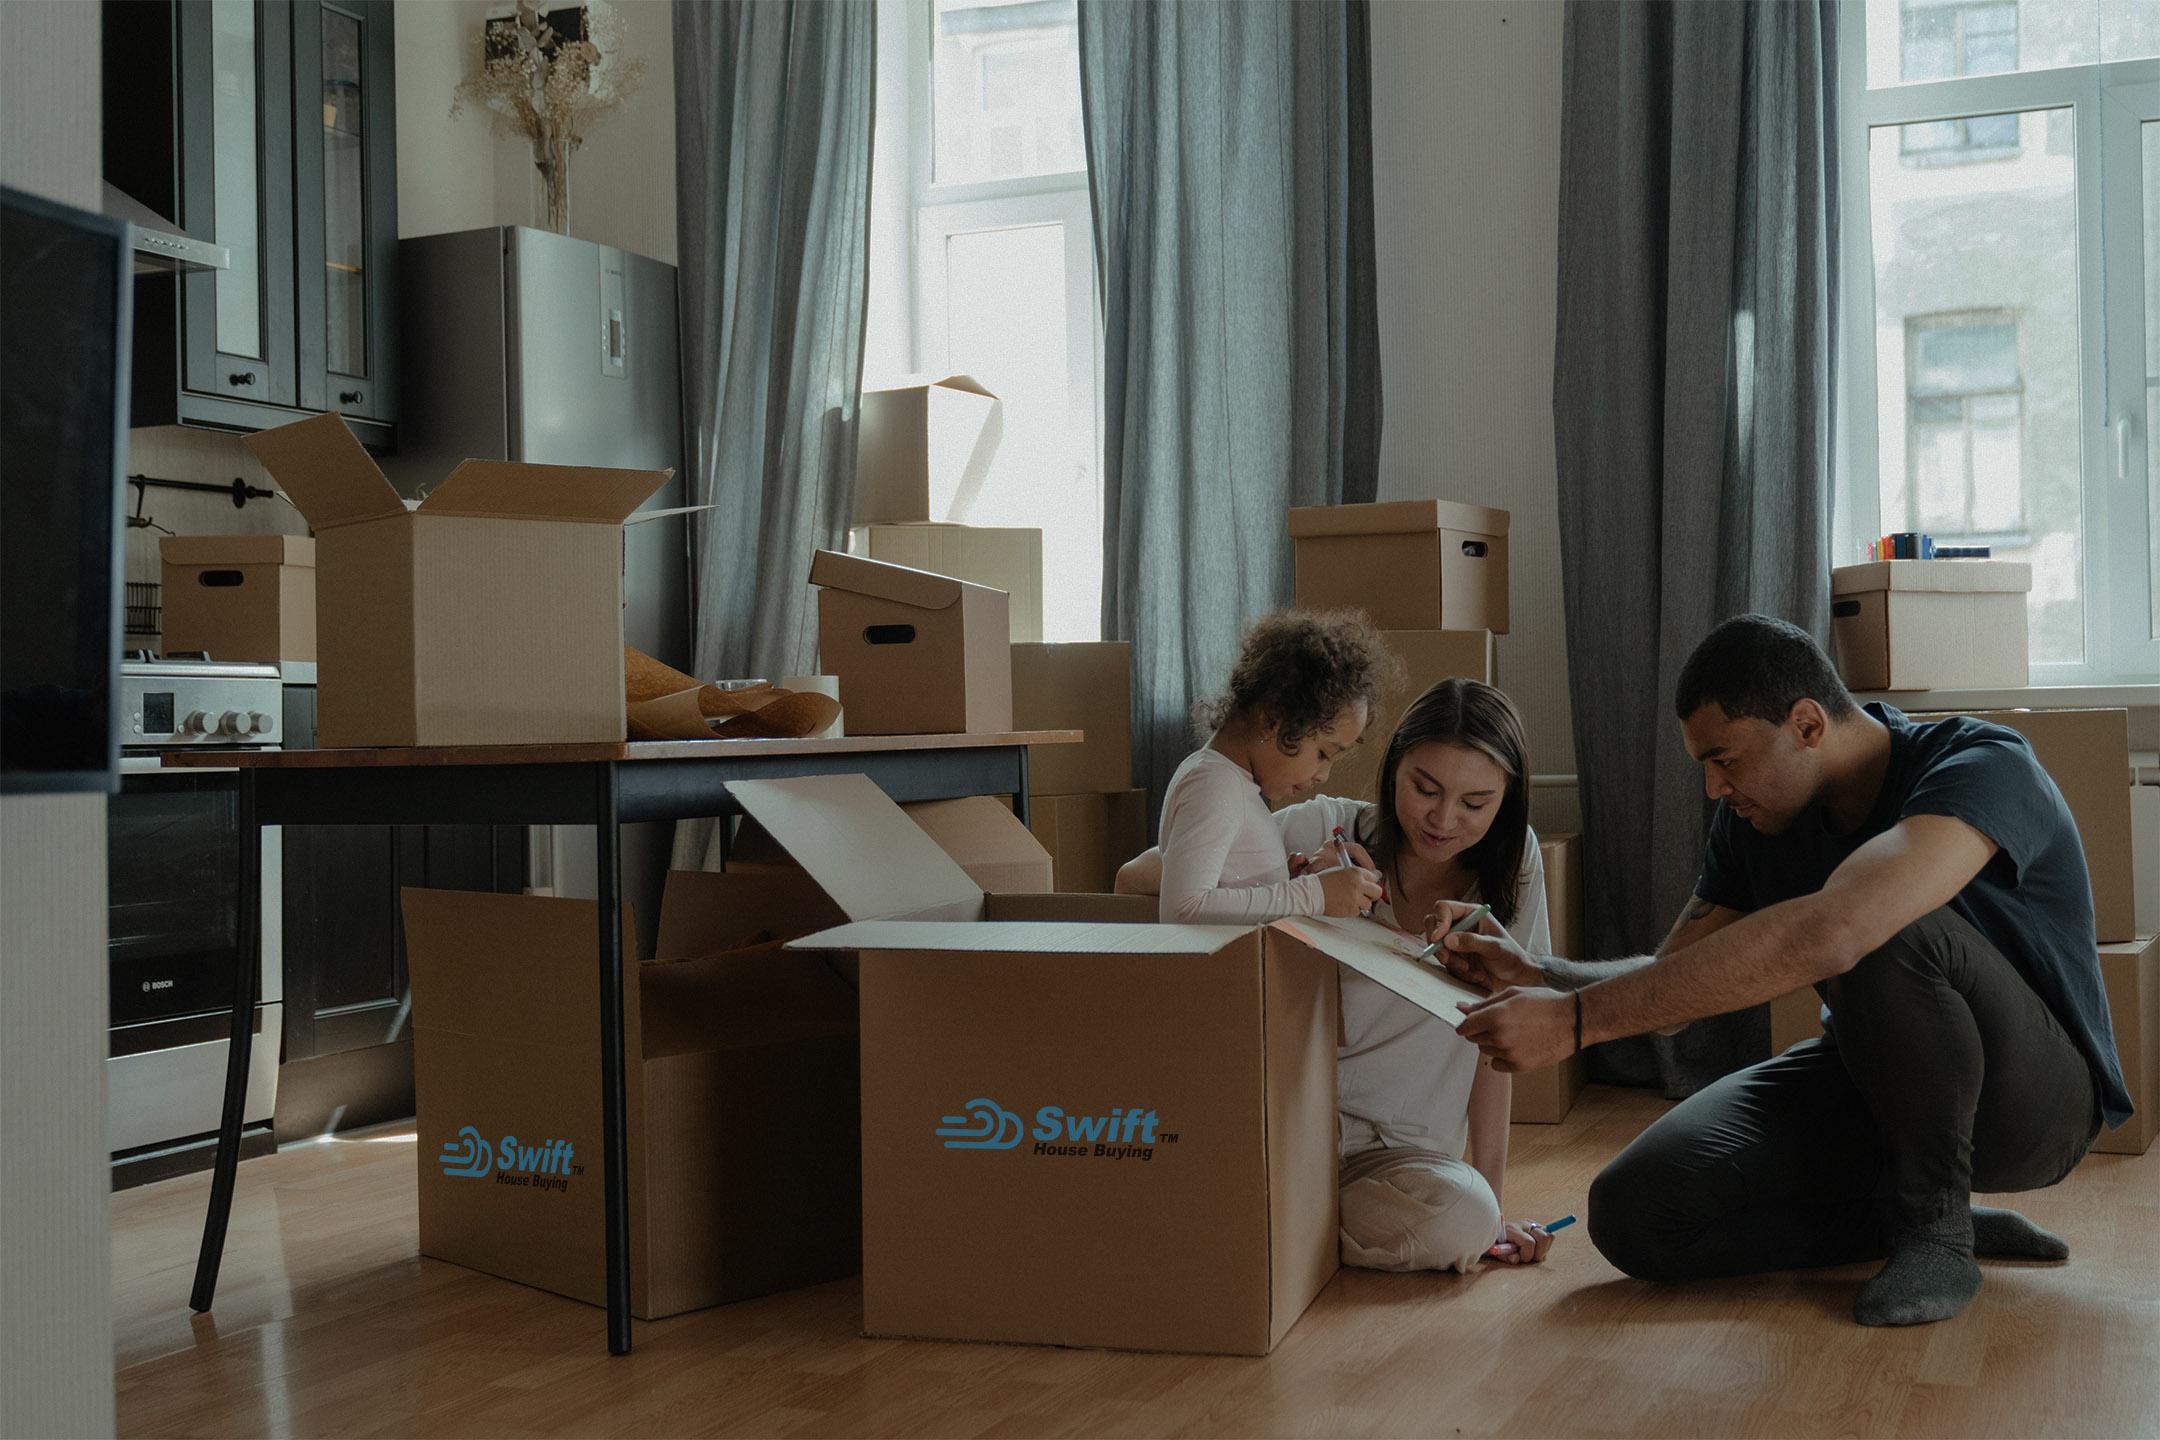 people sitting around swift real estate boxes smiling